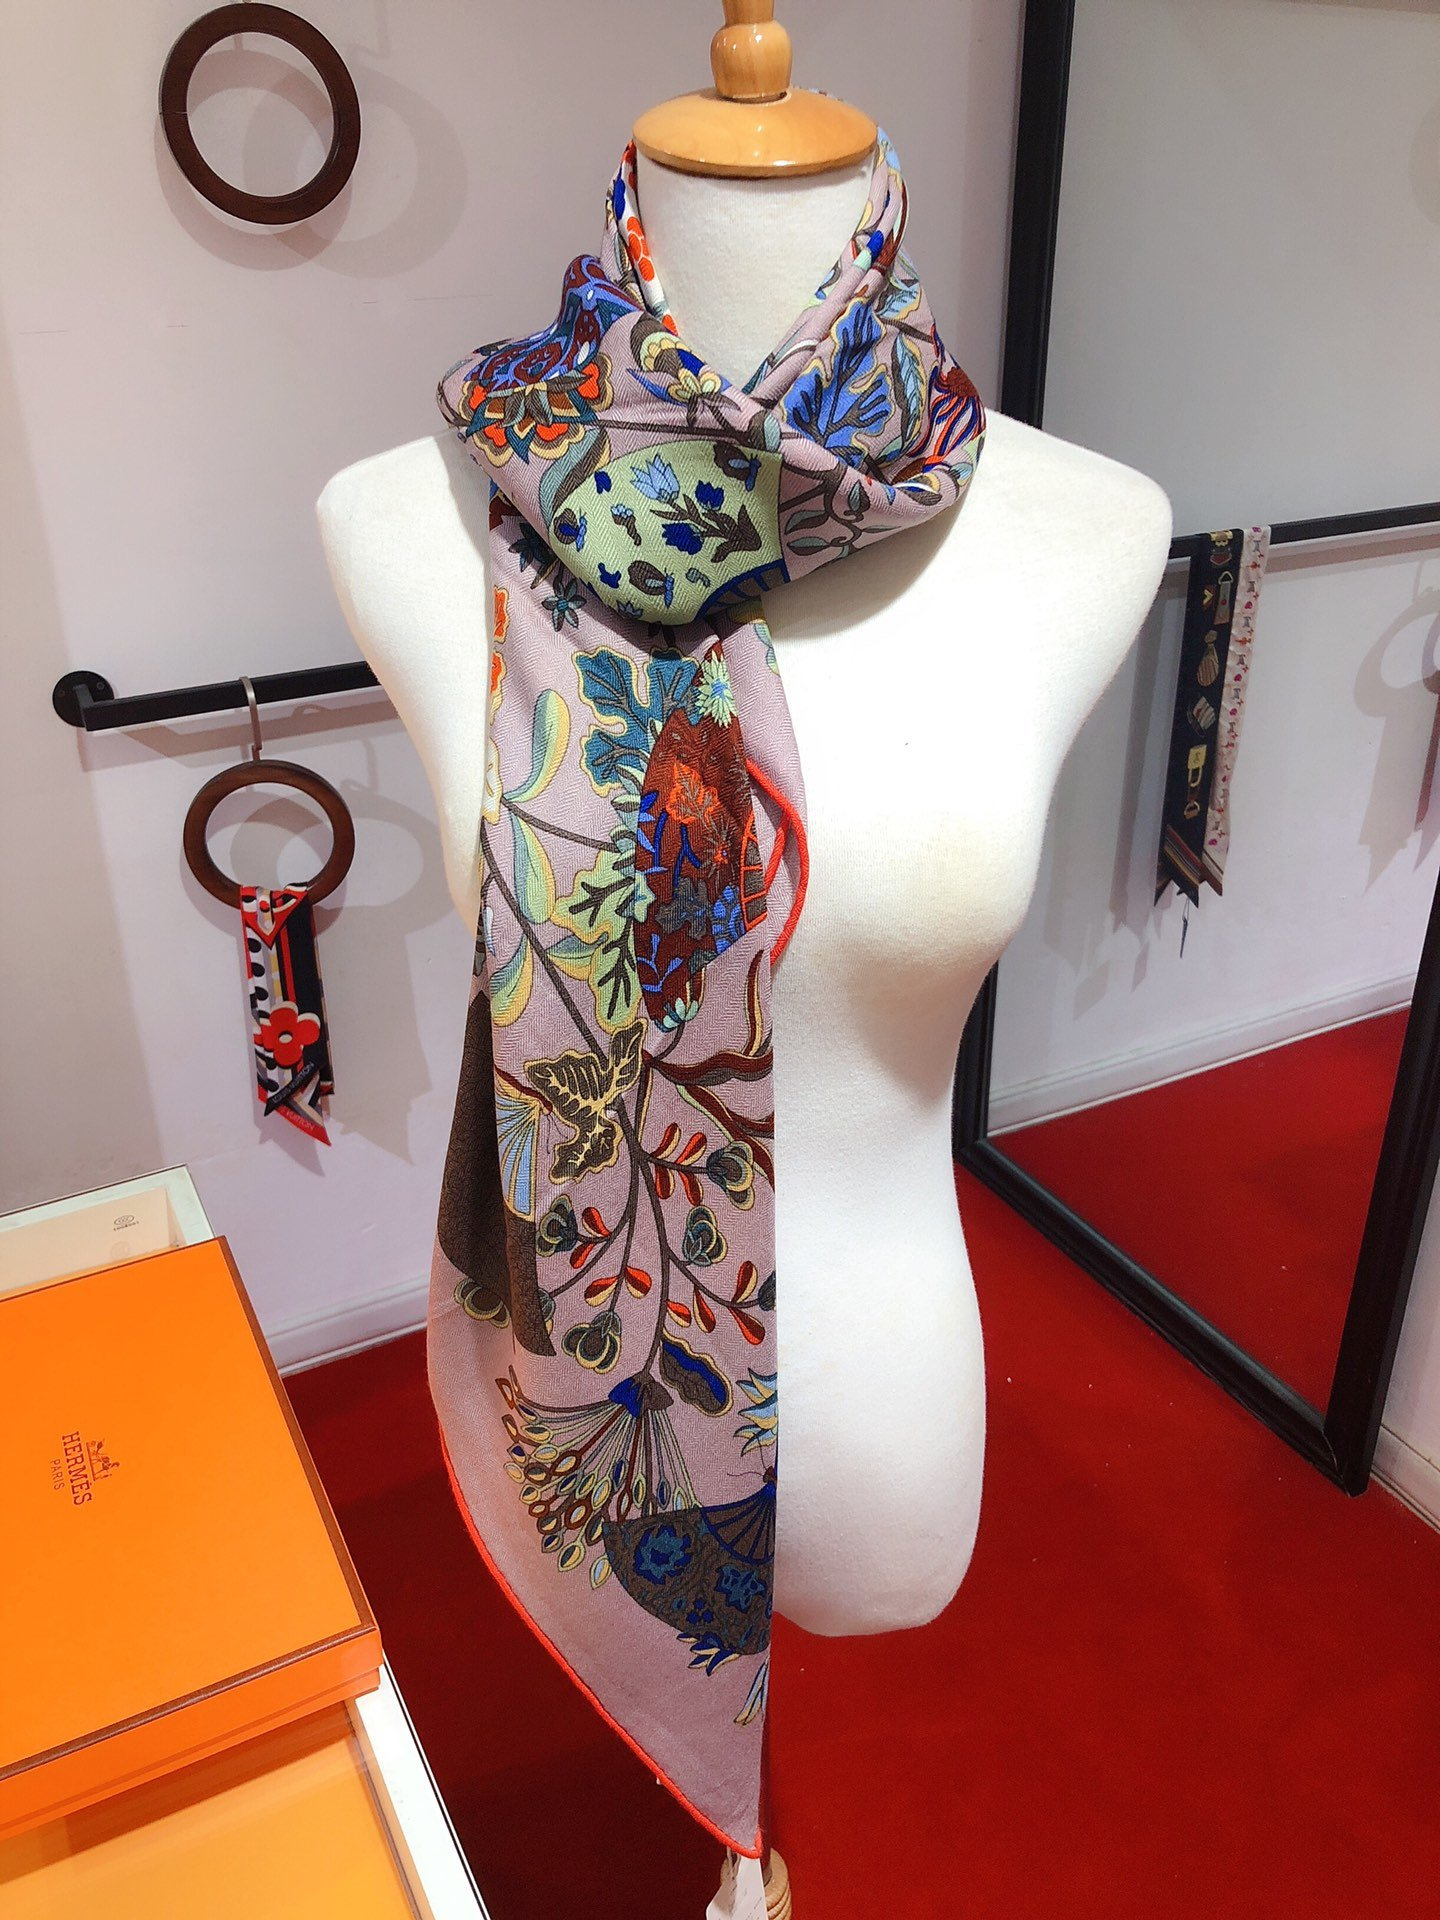 H家新款蝴蝶扇语140cm丝绒方巾专